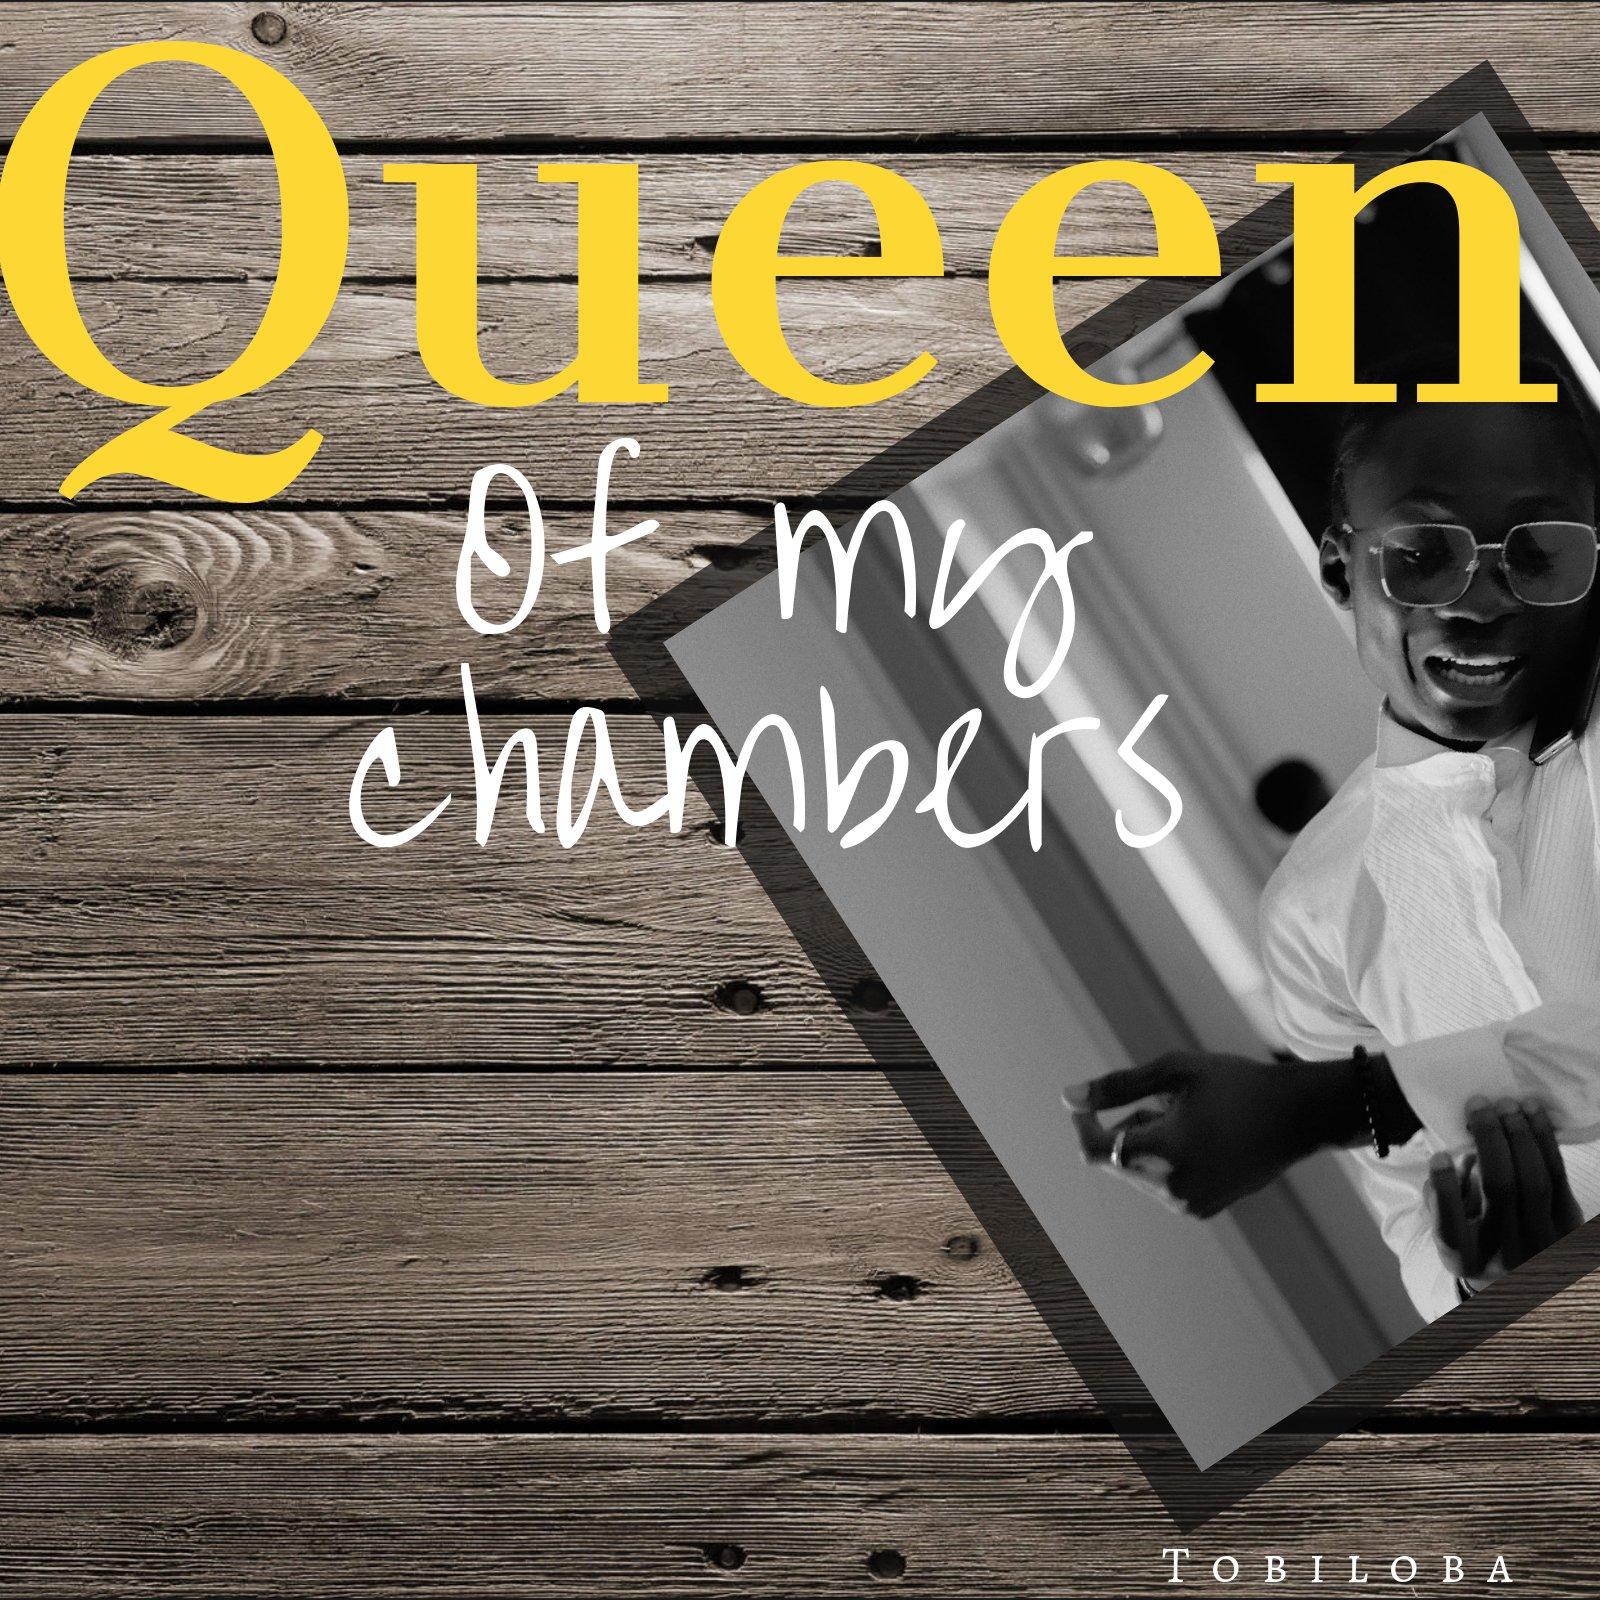 Tobiloba - Queen of my Chambers Lyrics & Mp3 Download